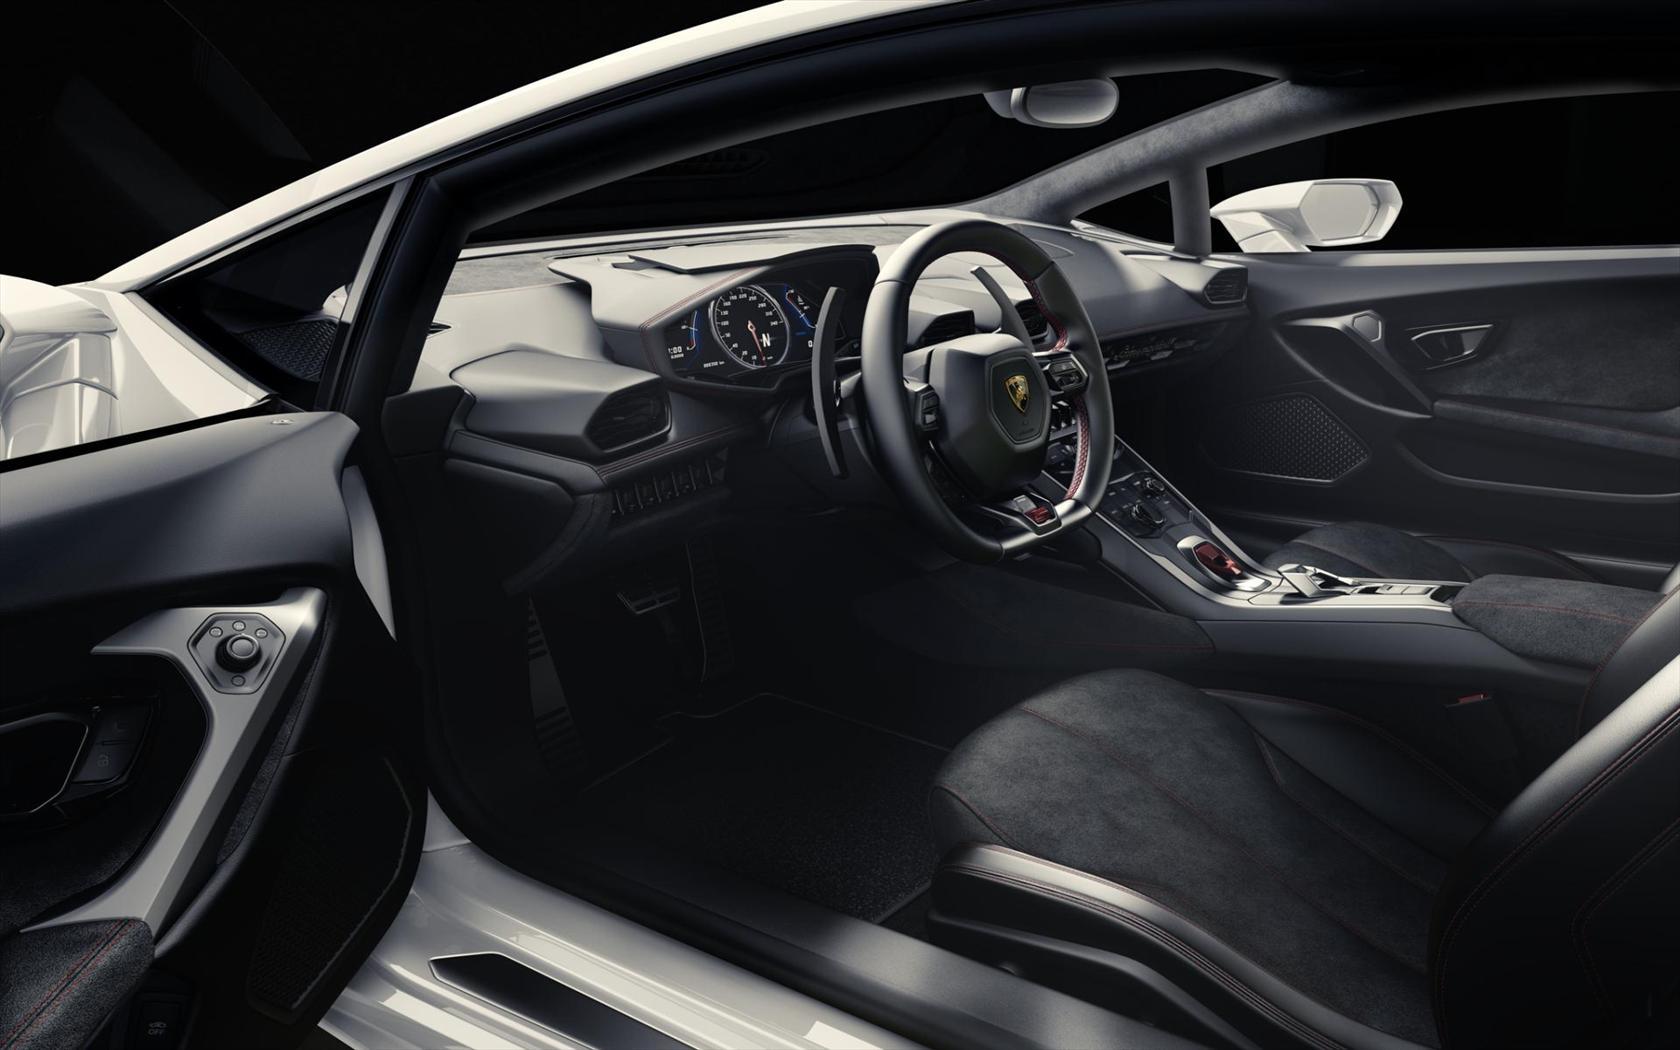 Lamborghini Huracan Lp 610 4 Interior Wallpaper 48583 1680x1050px